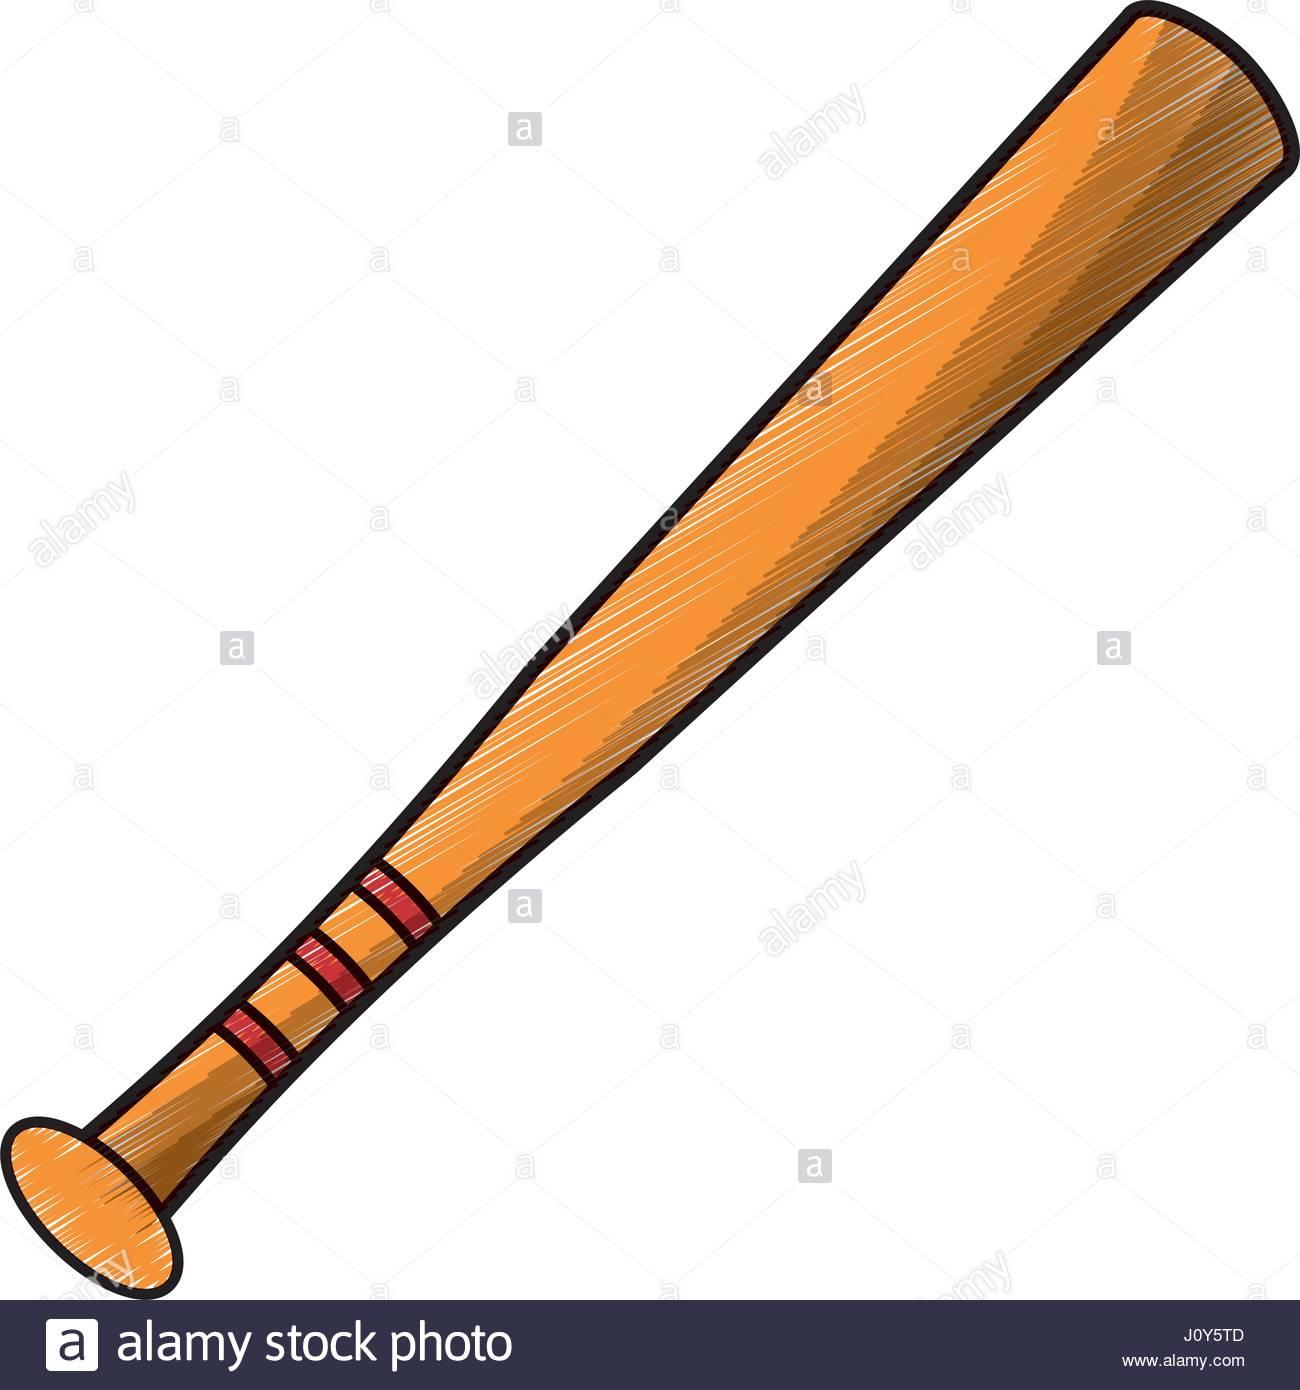 1300x1390 Drawing Bat Baseball Equipment Stock Vector Art Amp Illustration